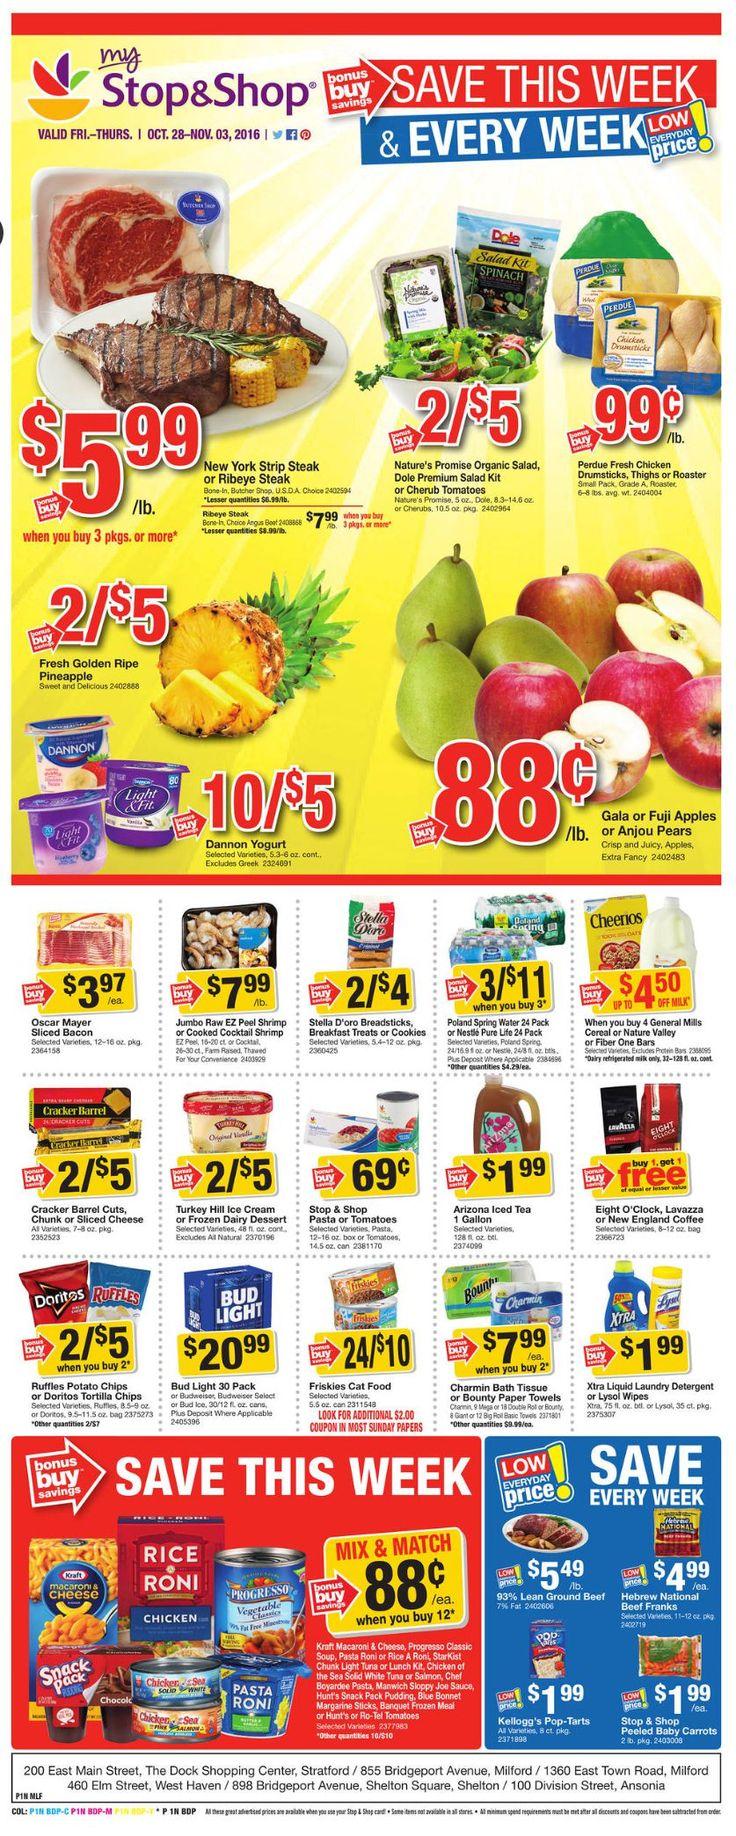 Stop and Shop Circular October 28 - November 3, 2016 - http://www.olcatalog.com/grocery/stop-and-shop-circular.html